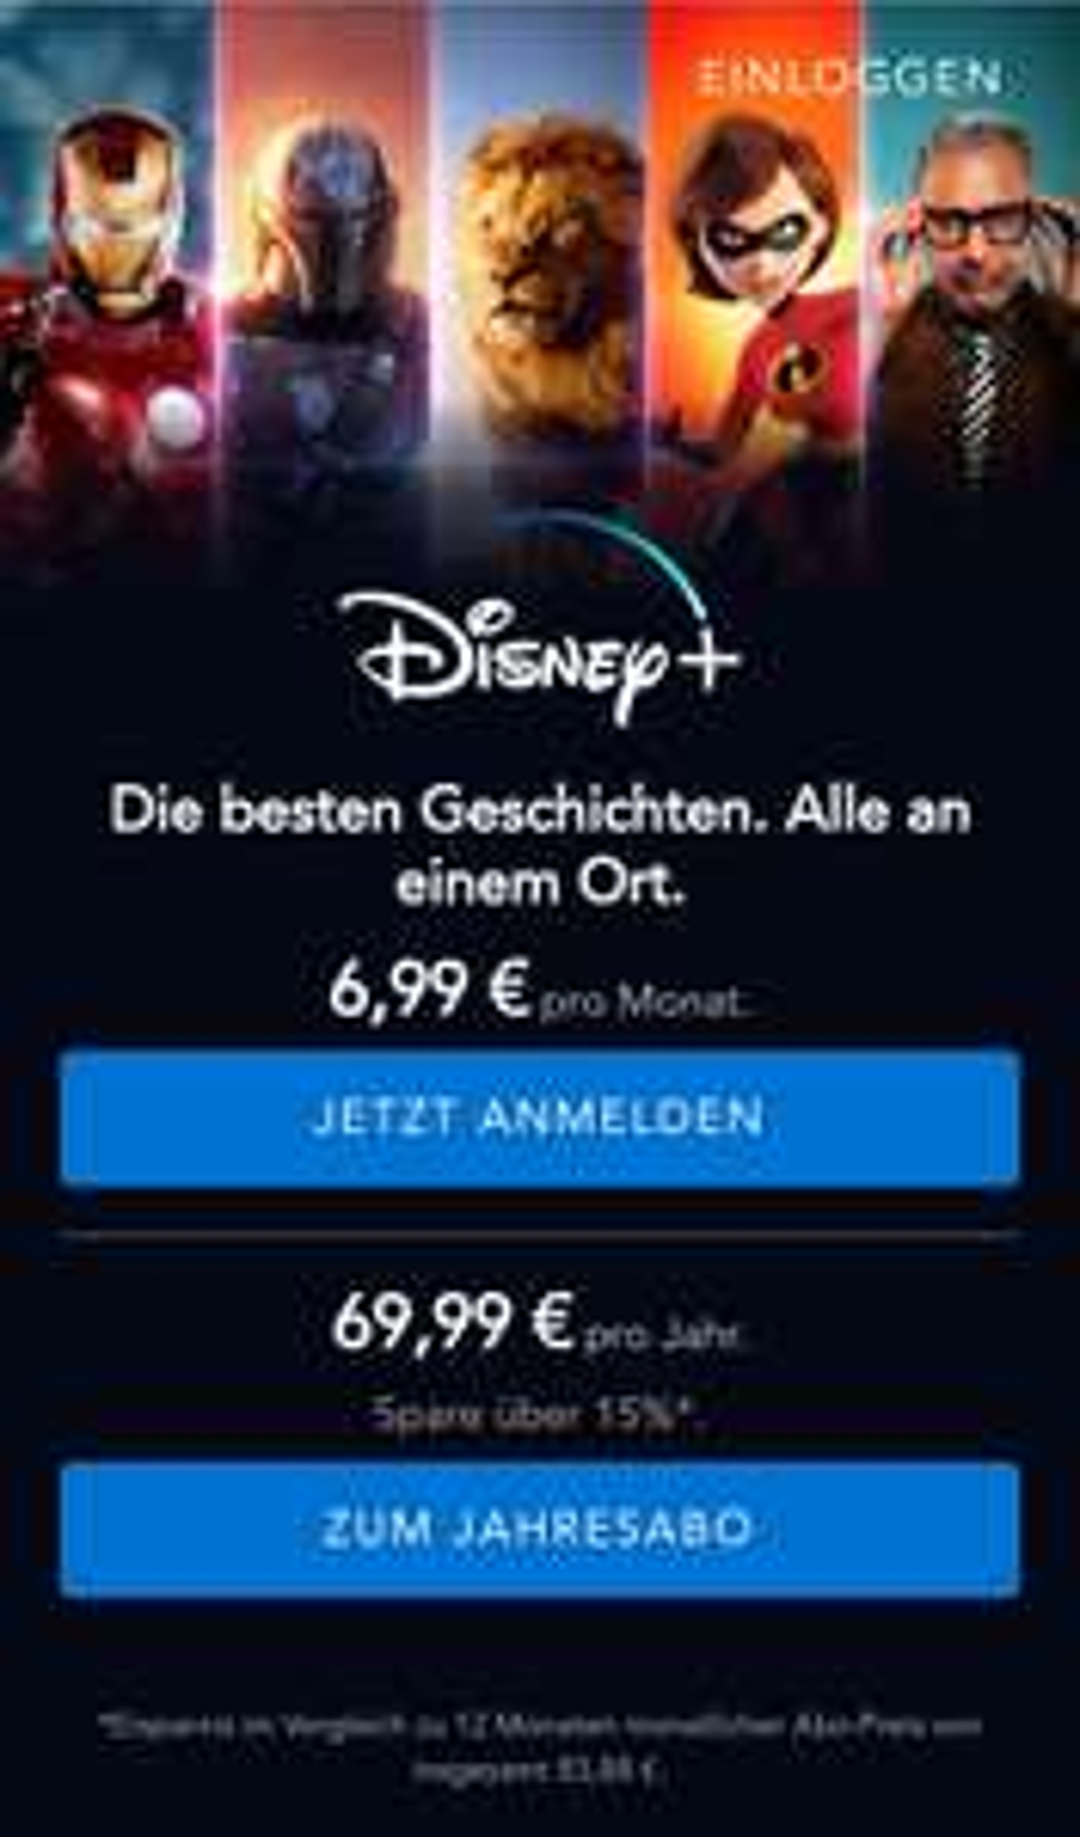 Disney+ 500 Extra Payback Punkte auf Monatsabo